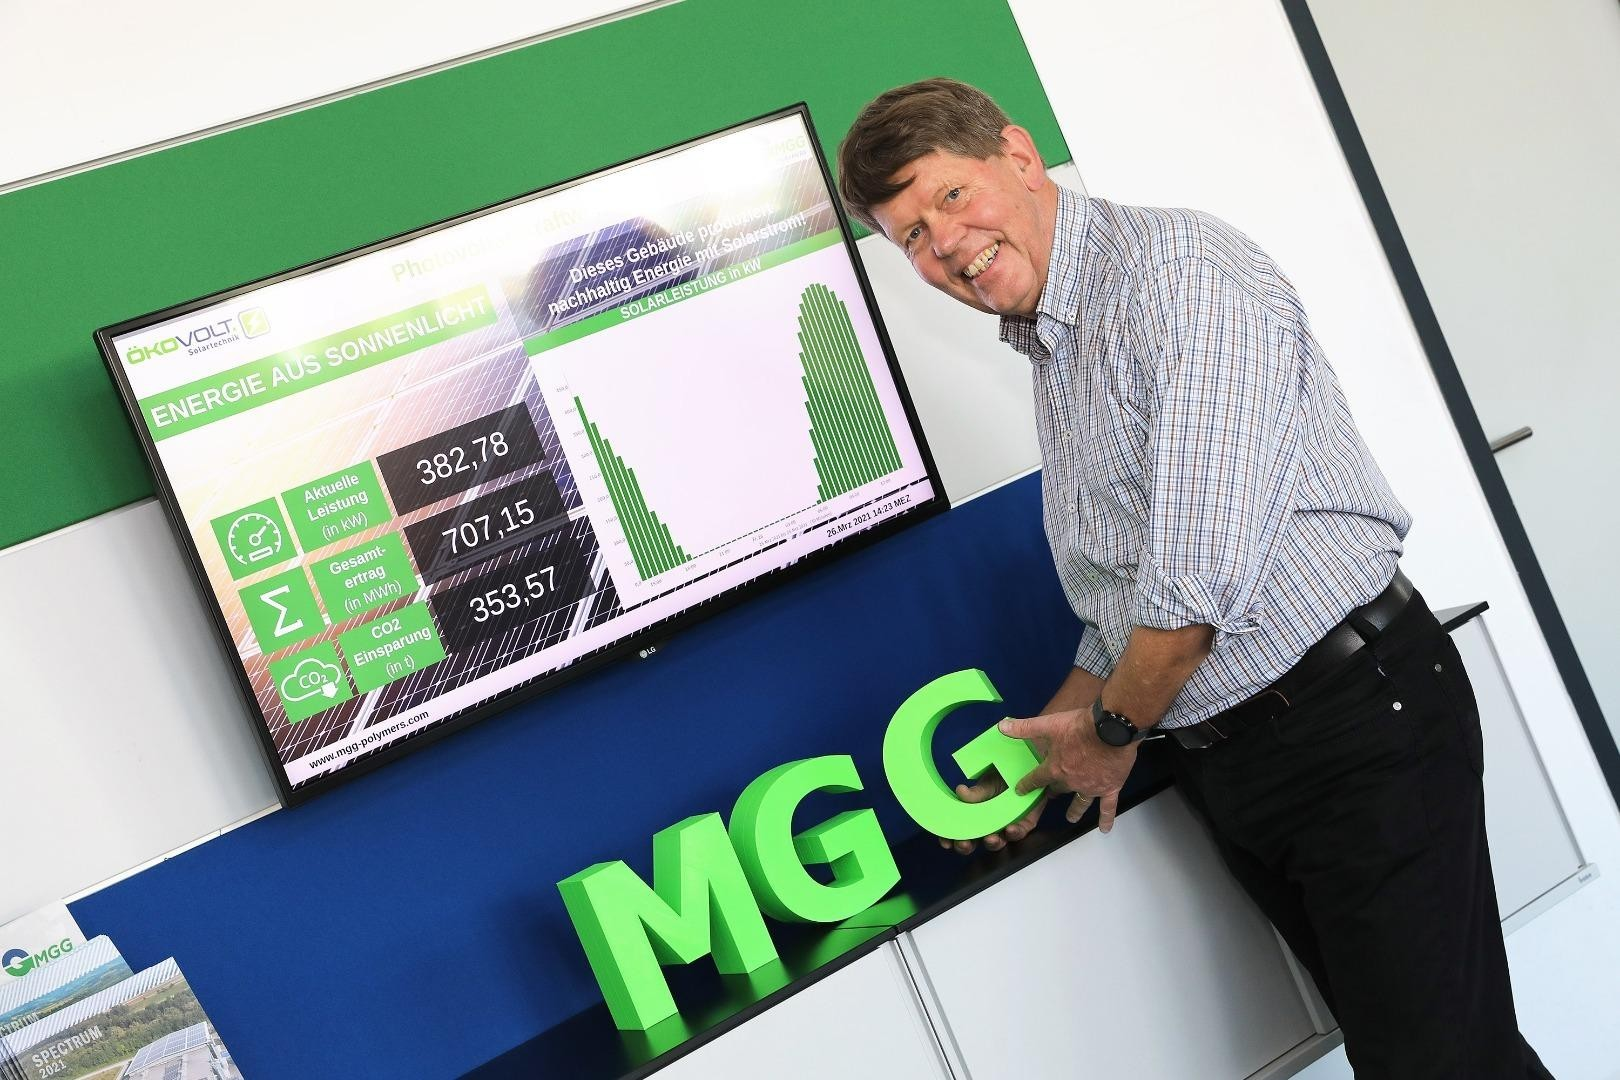 MGG-Polymers_Chris-Slijkhuis_(c)kommunikationsagentur-sengstschmid_0340.jpg